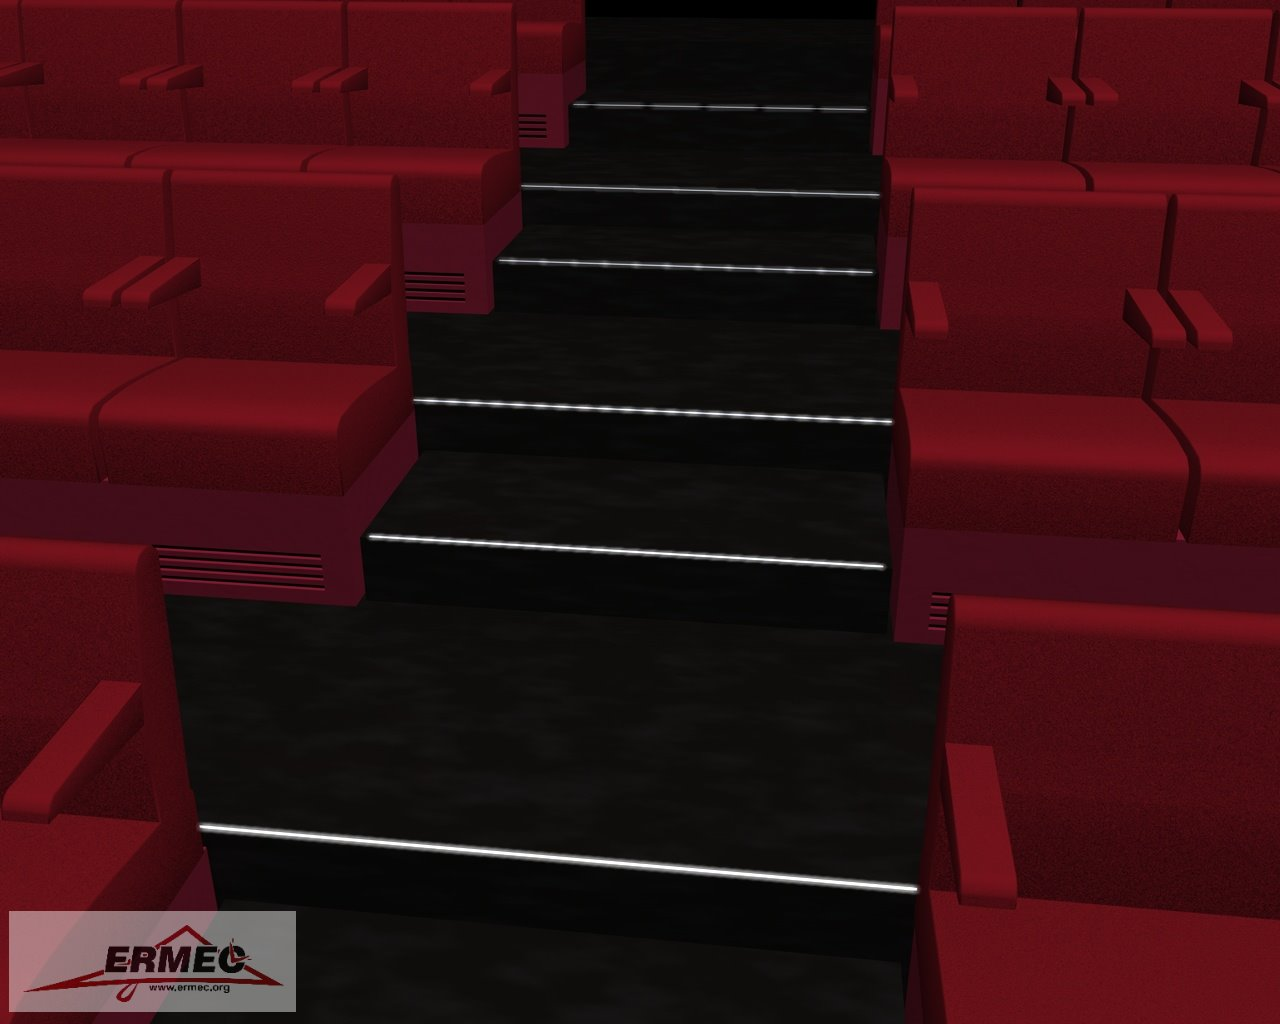 Realizaci n de proyectos de iluminaci n led de escaleras - Iluminacion de escaleras ...